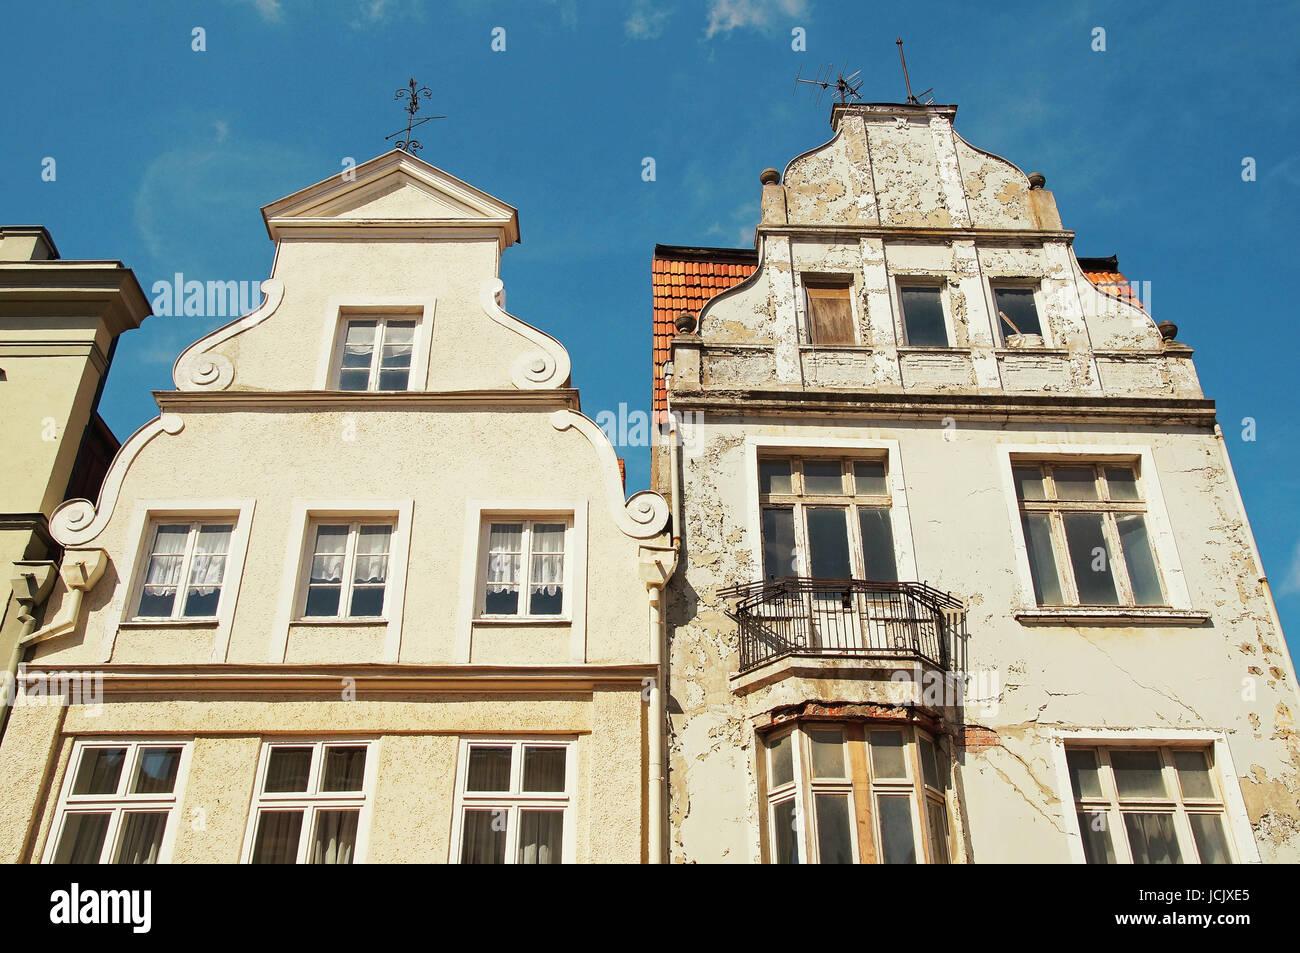 Altbau Wismar Deutschland / Old Apartment Building Wismar Germany - Stock Image